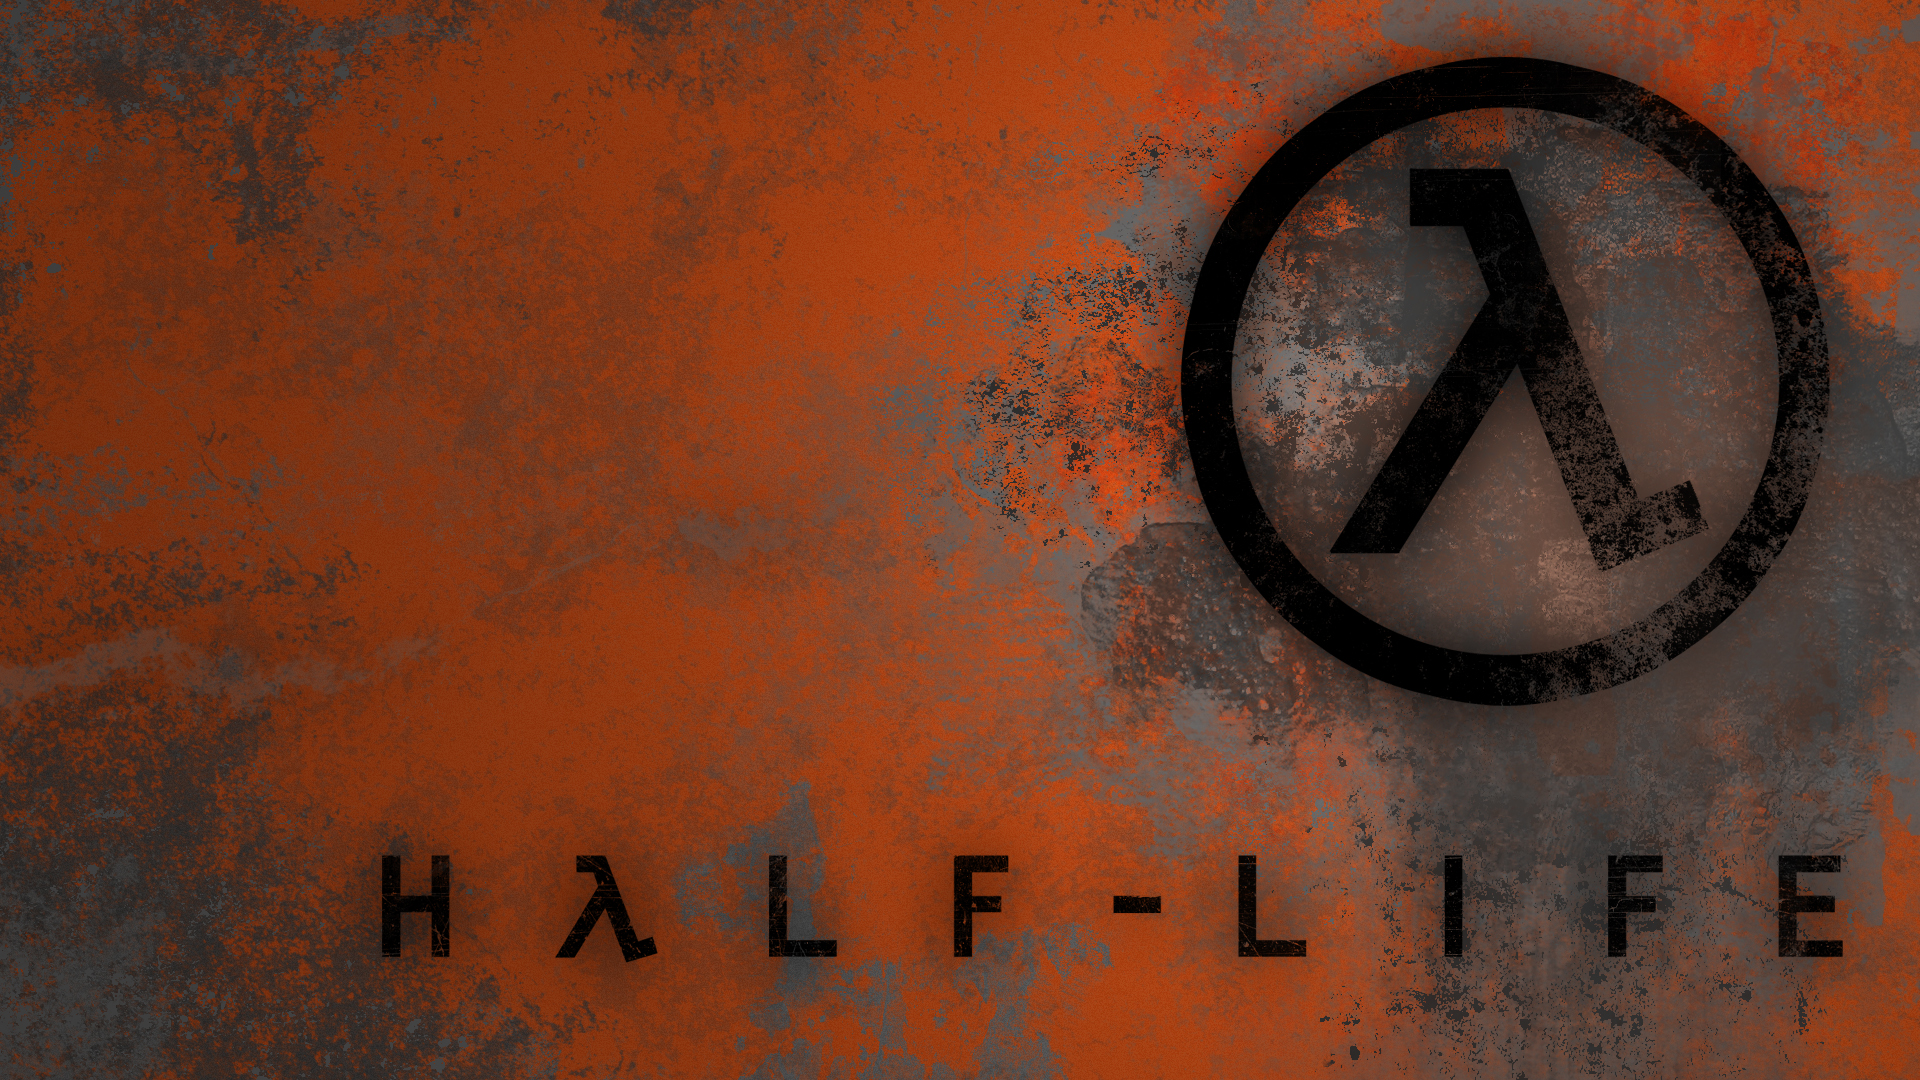 Half life 1080p wallpaper by caboose6789 d3ikf70 1920x1080